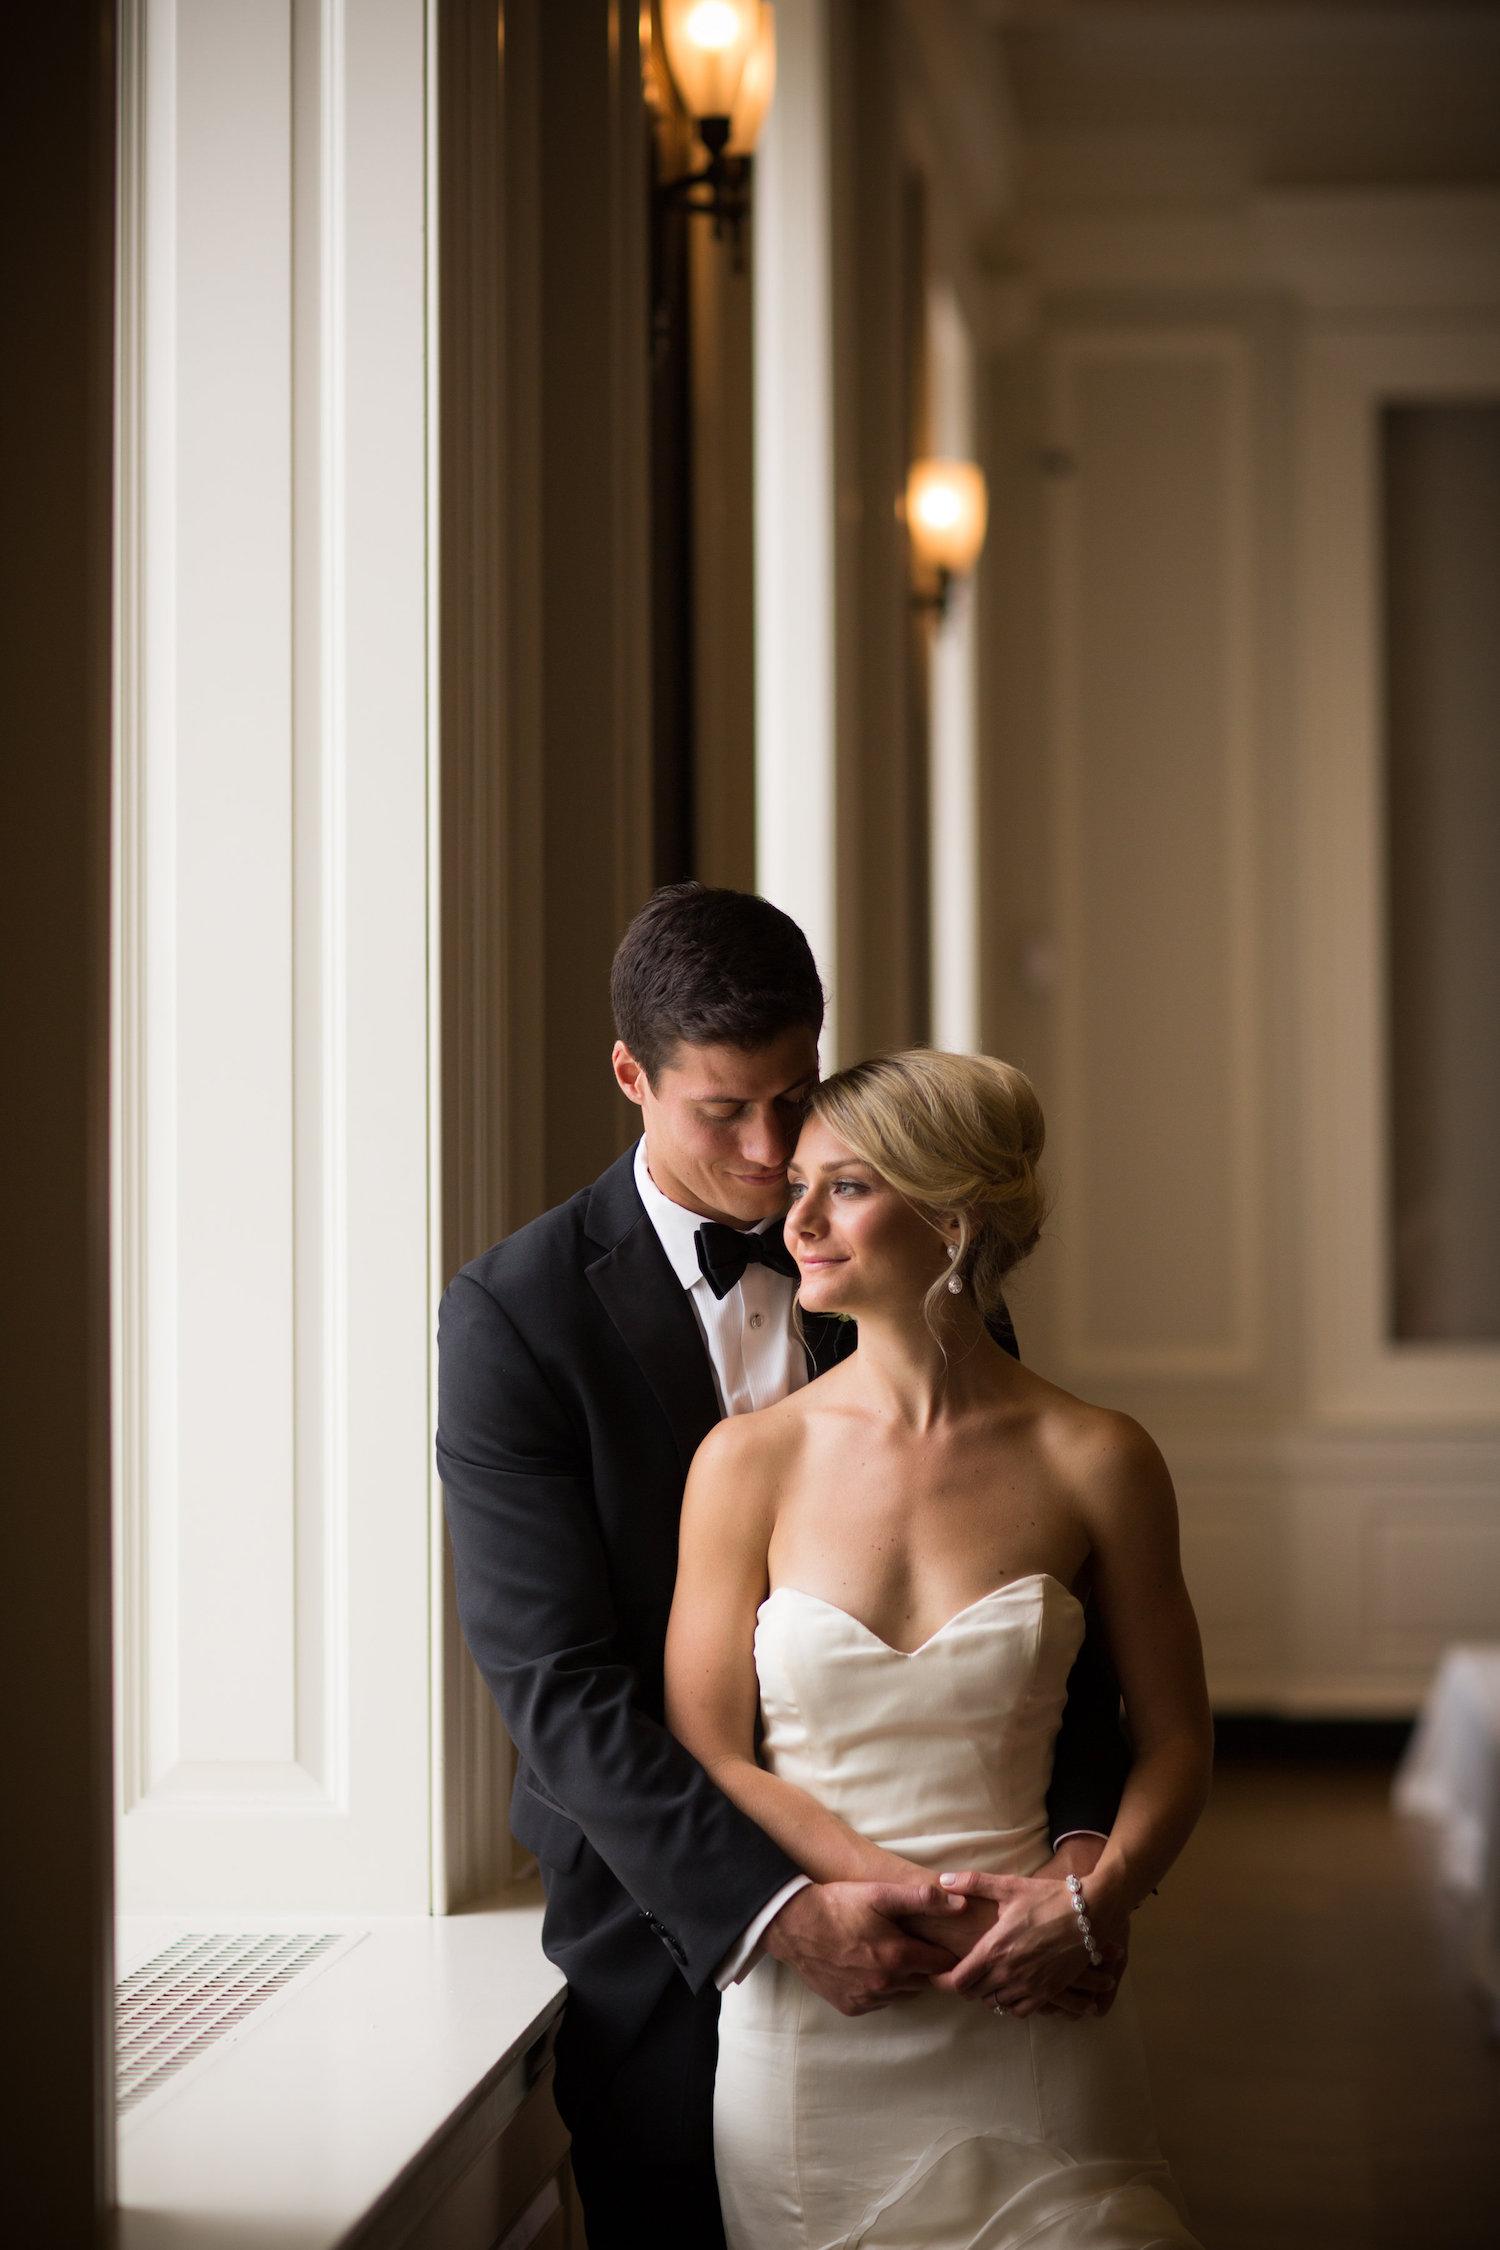 chicago-history-museum-wedding-18.jpg